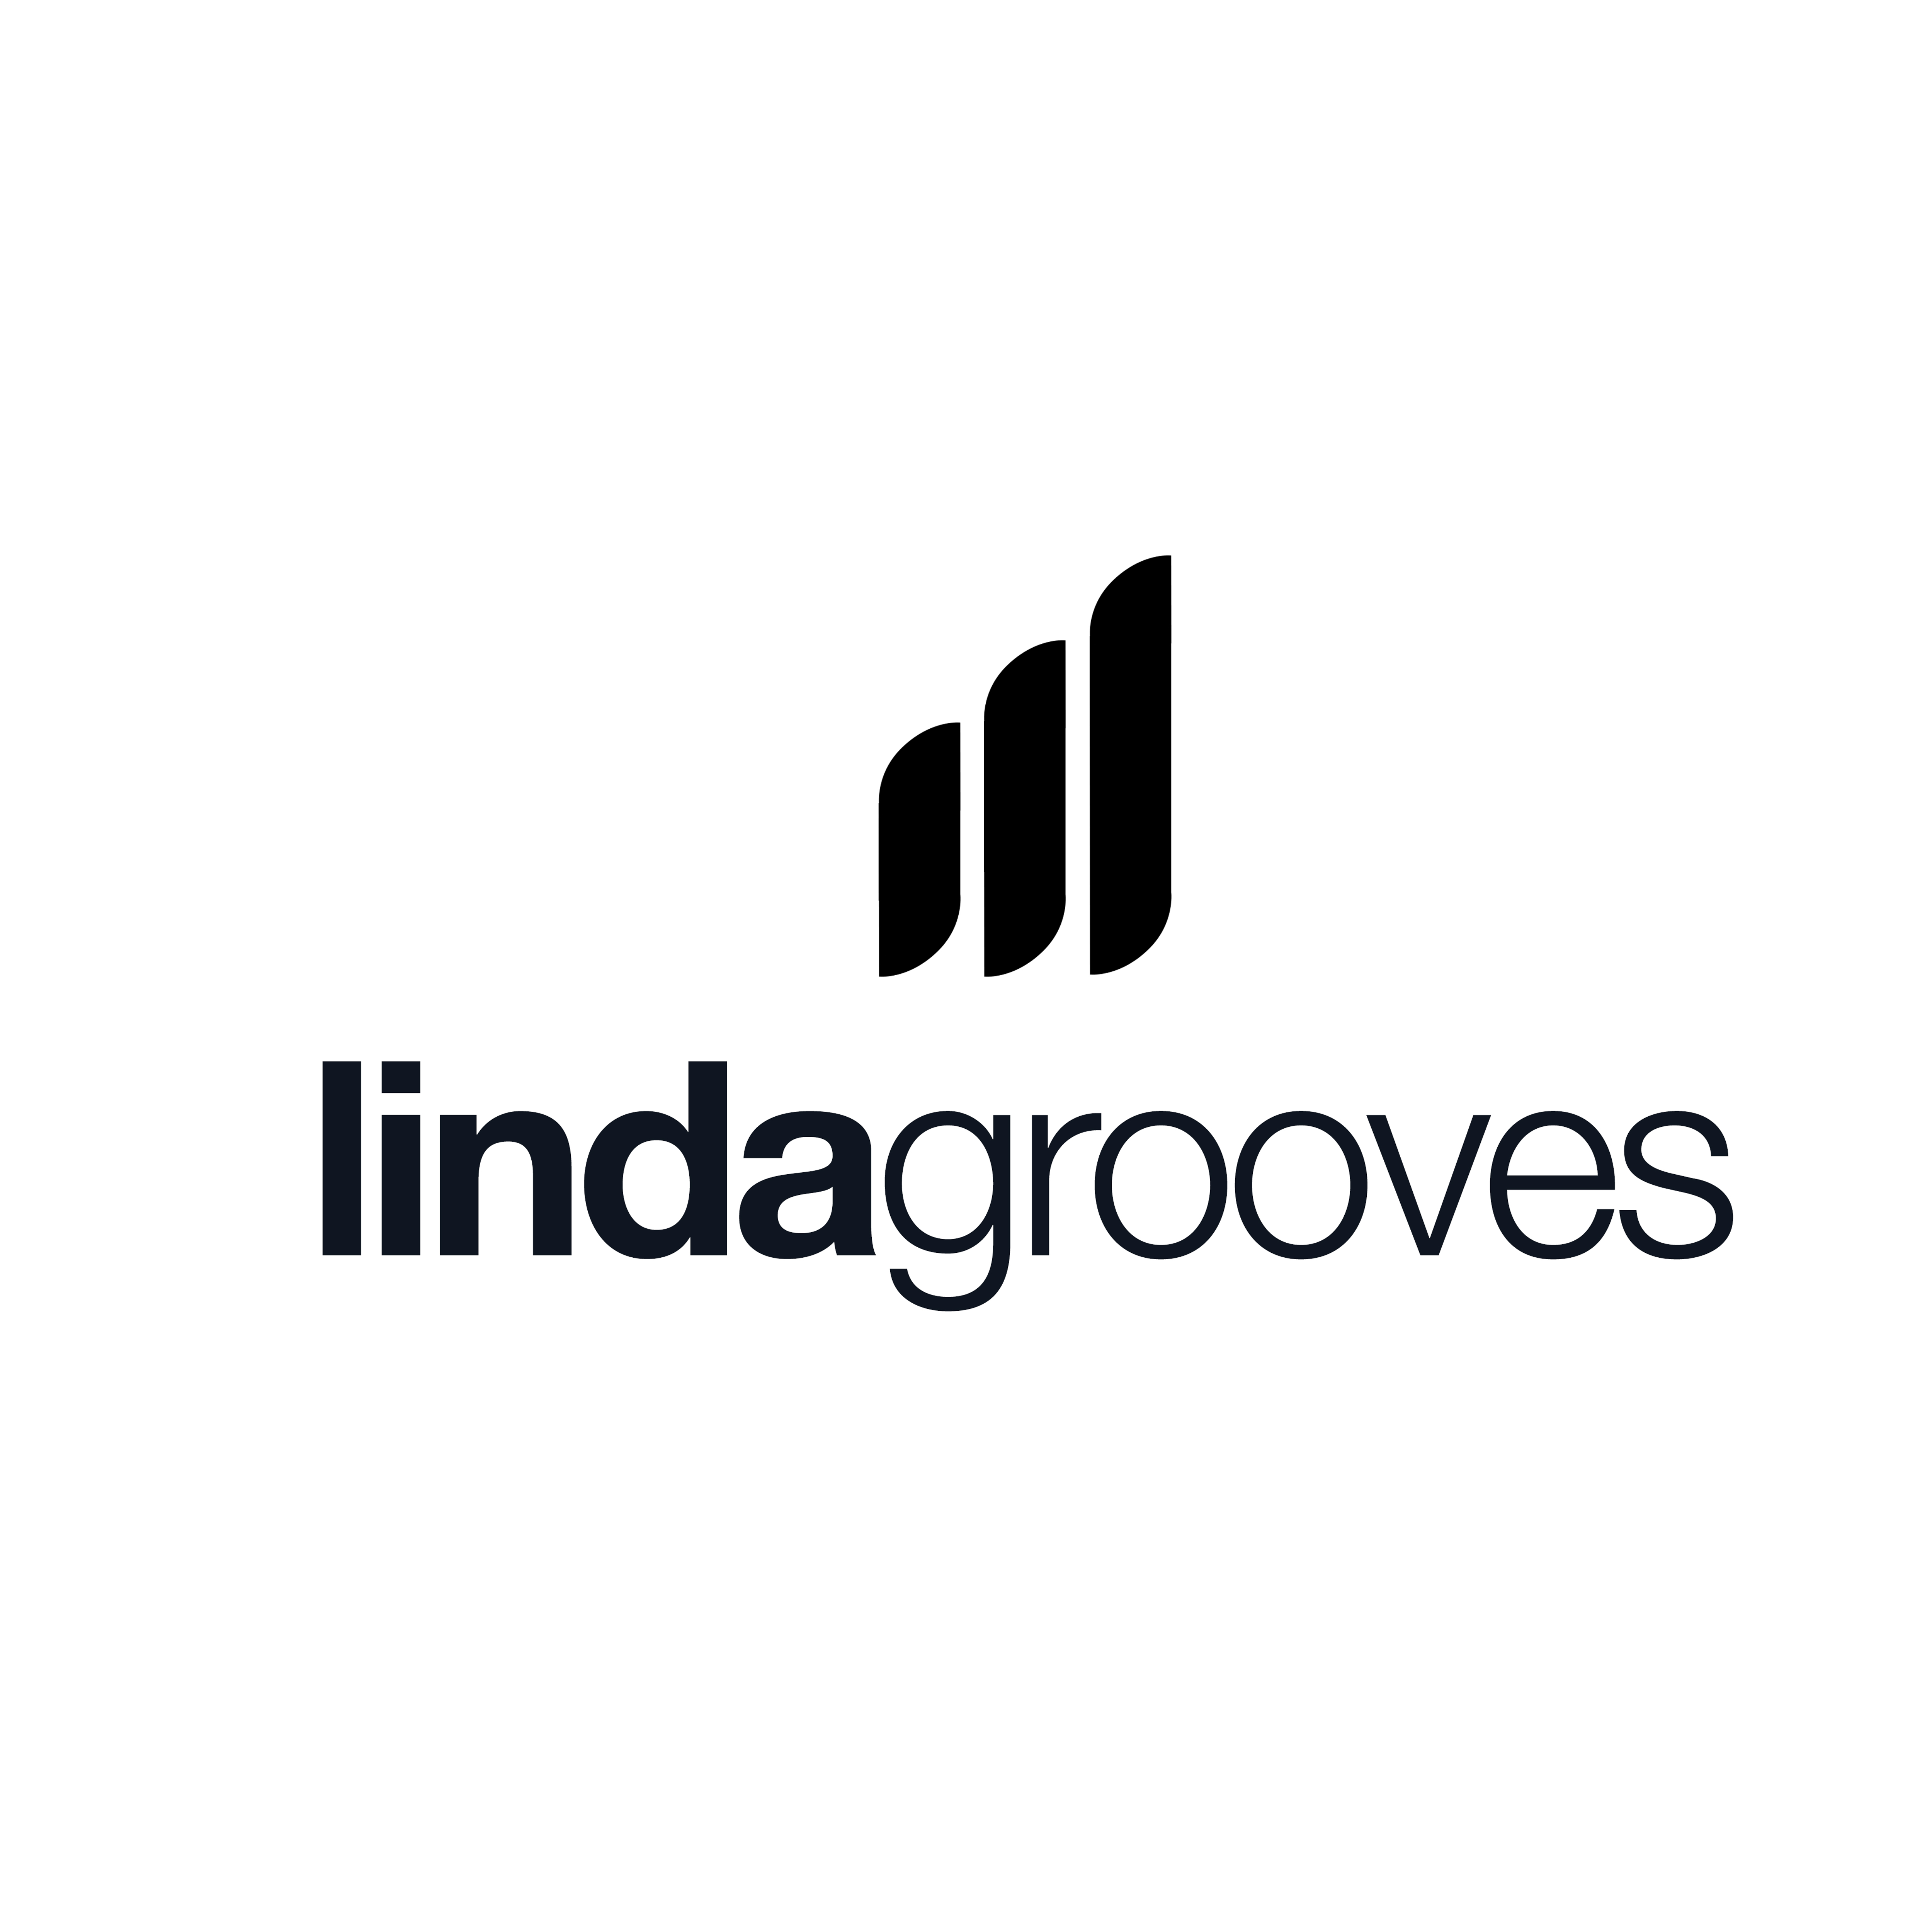 Lindagrooves